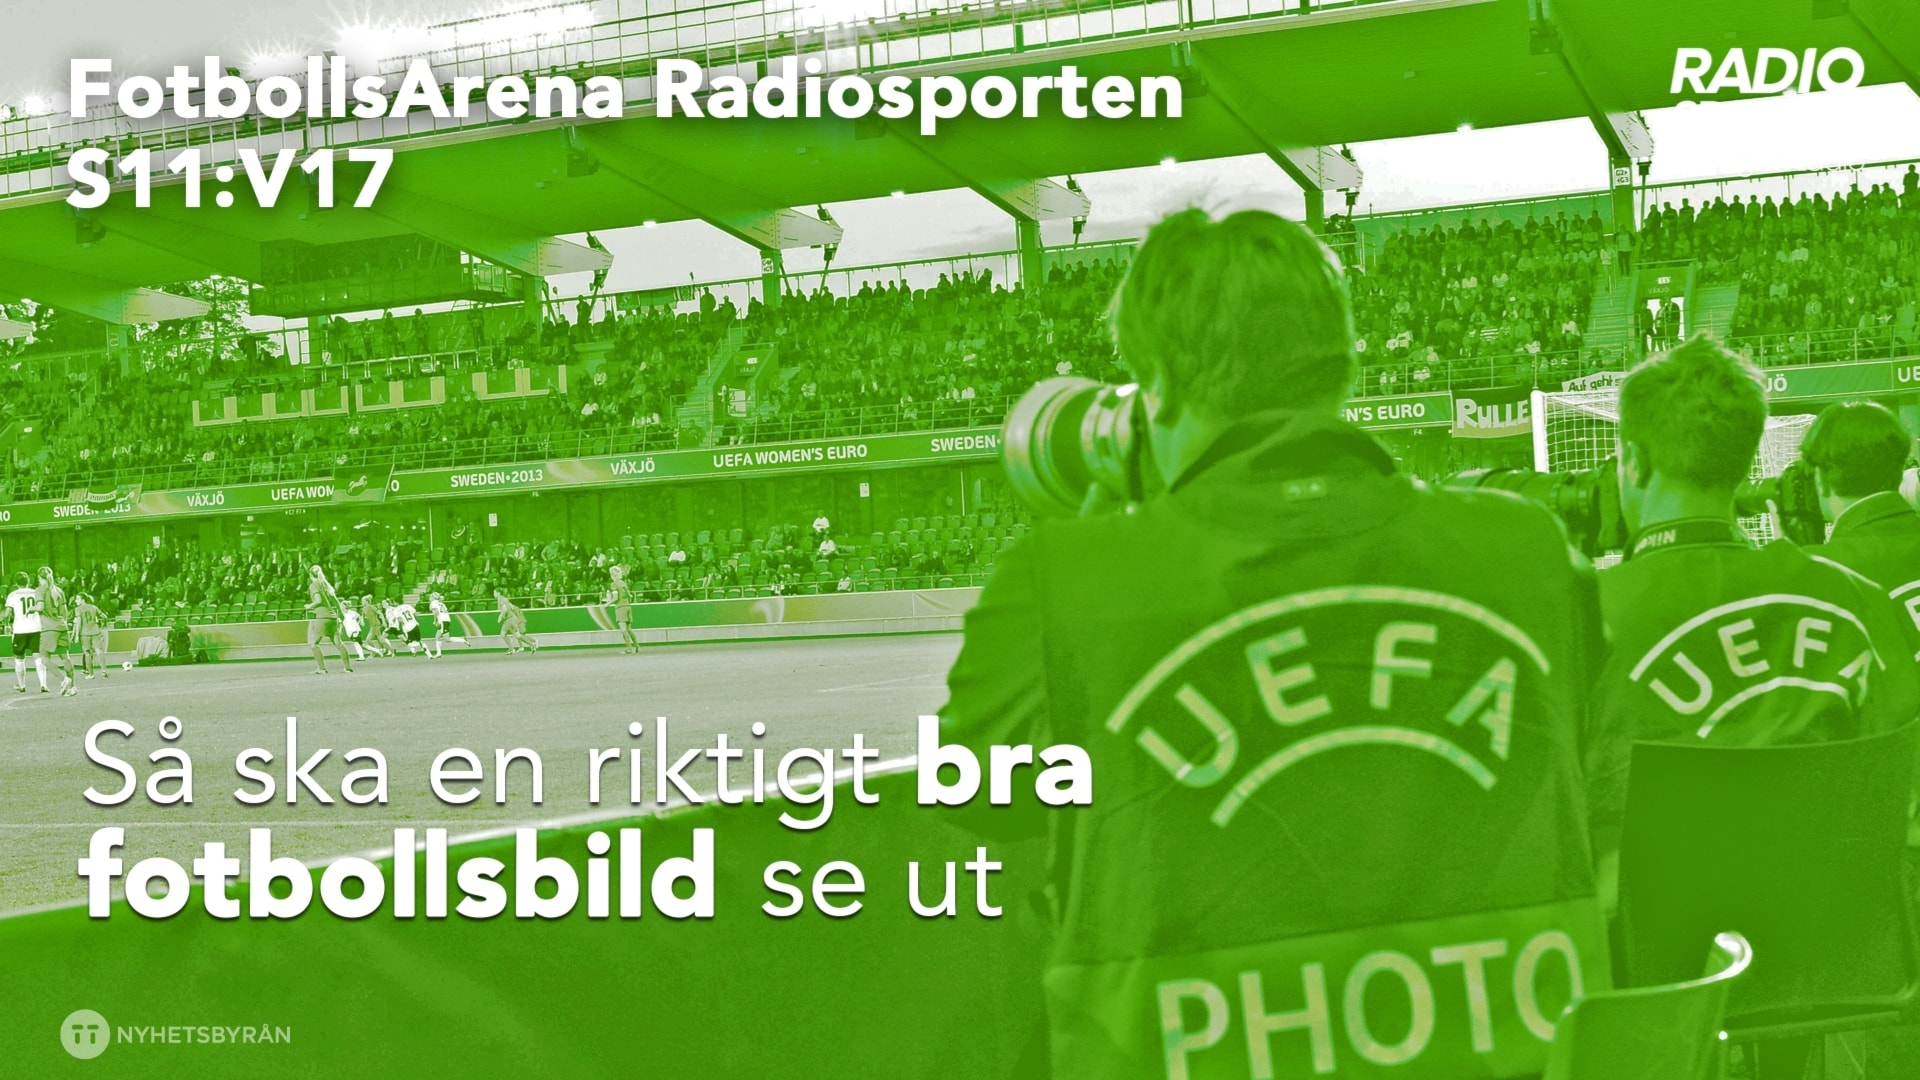 Fotbollsfotografen i fokus